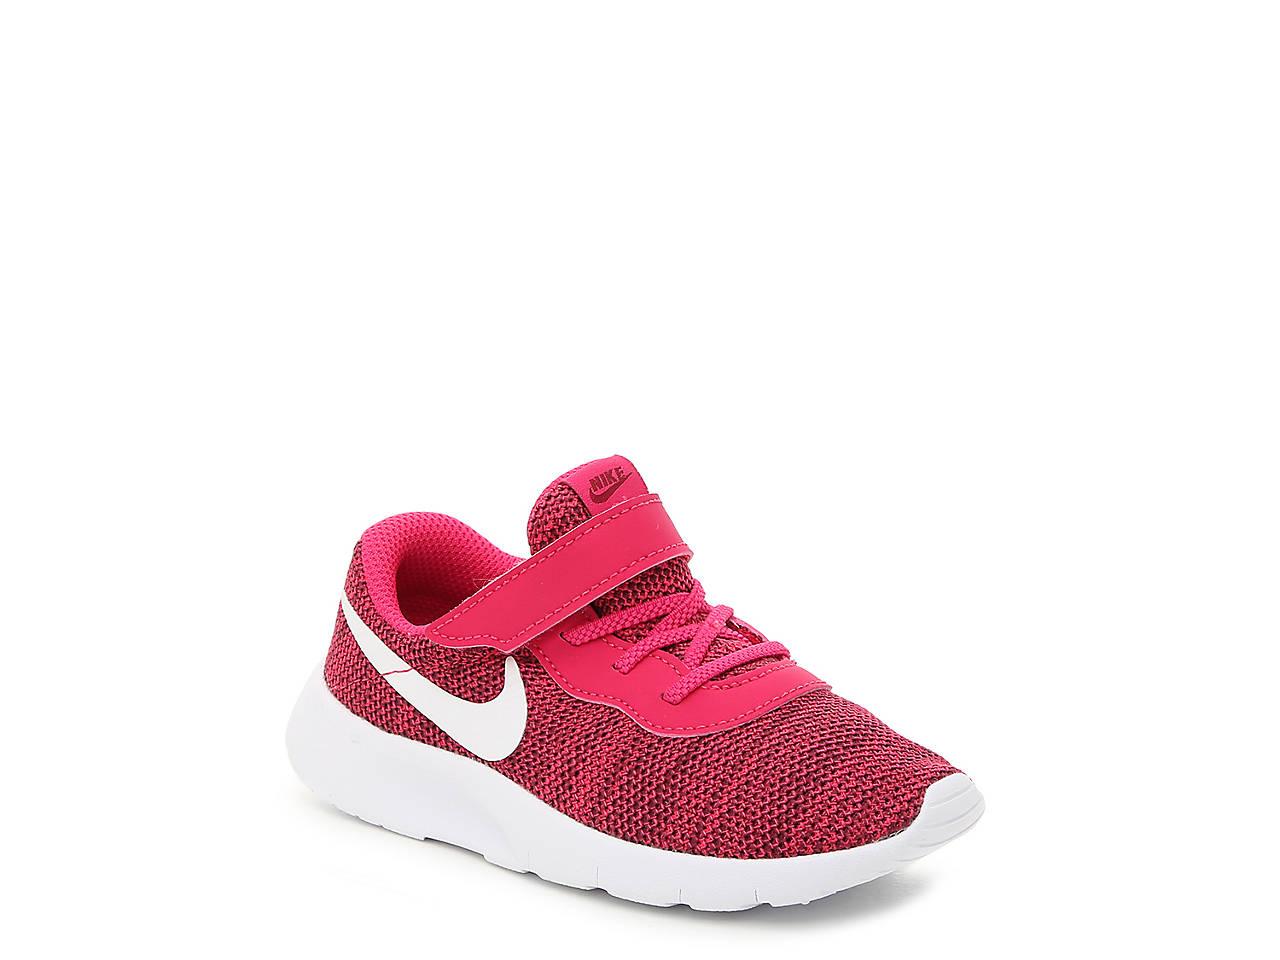 77a95ef05b14 Nike Tanjun Infant   Toddler Sneaker Kids Shoes